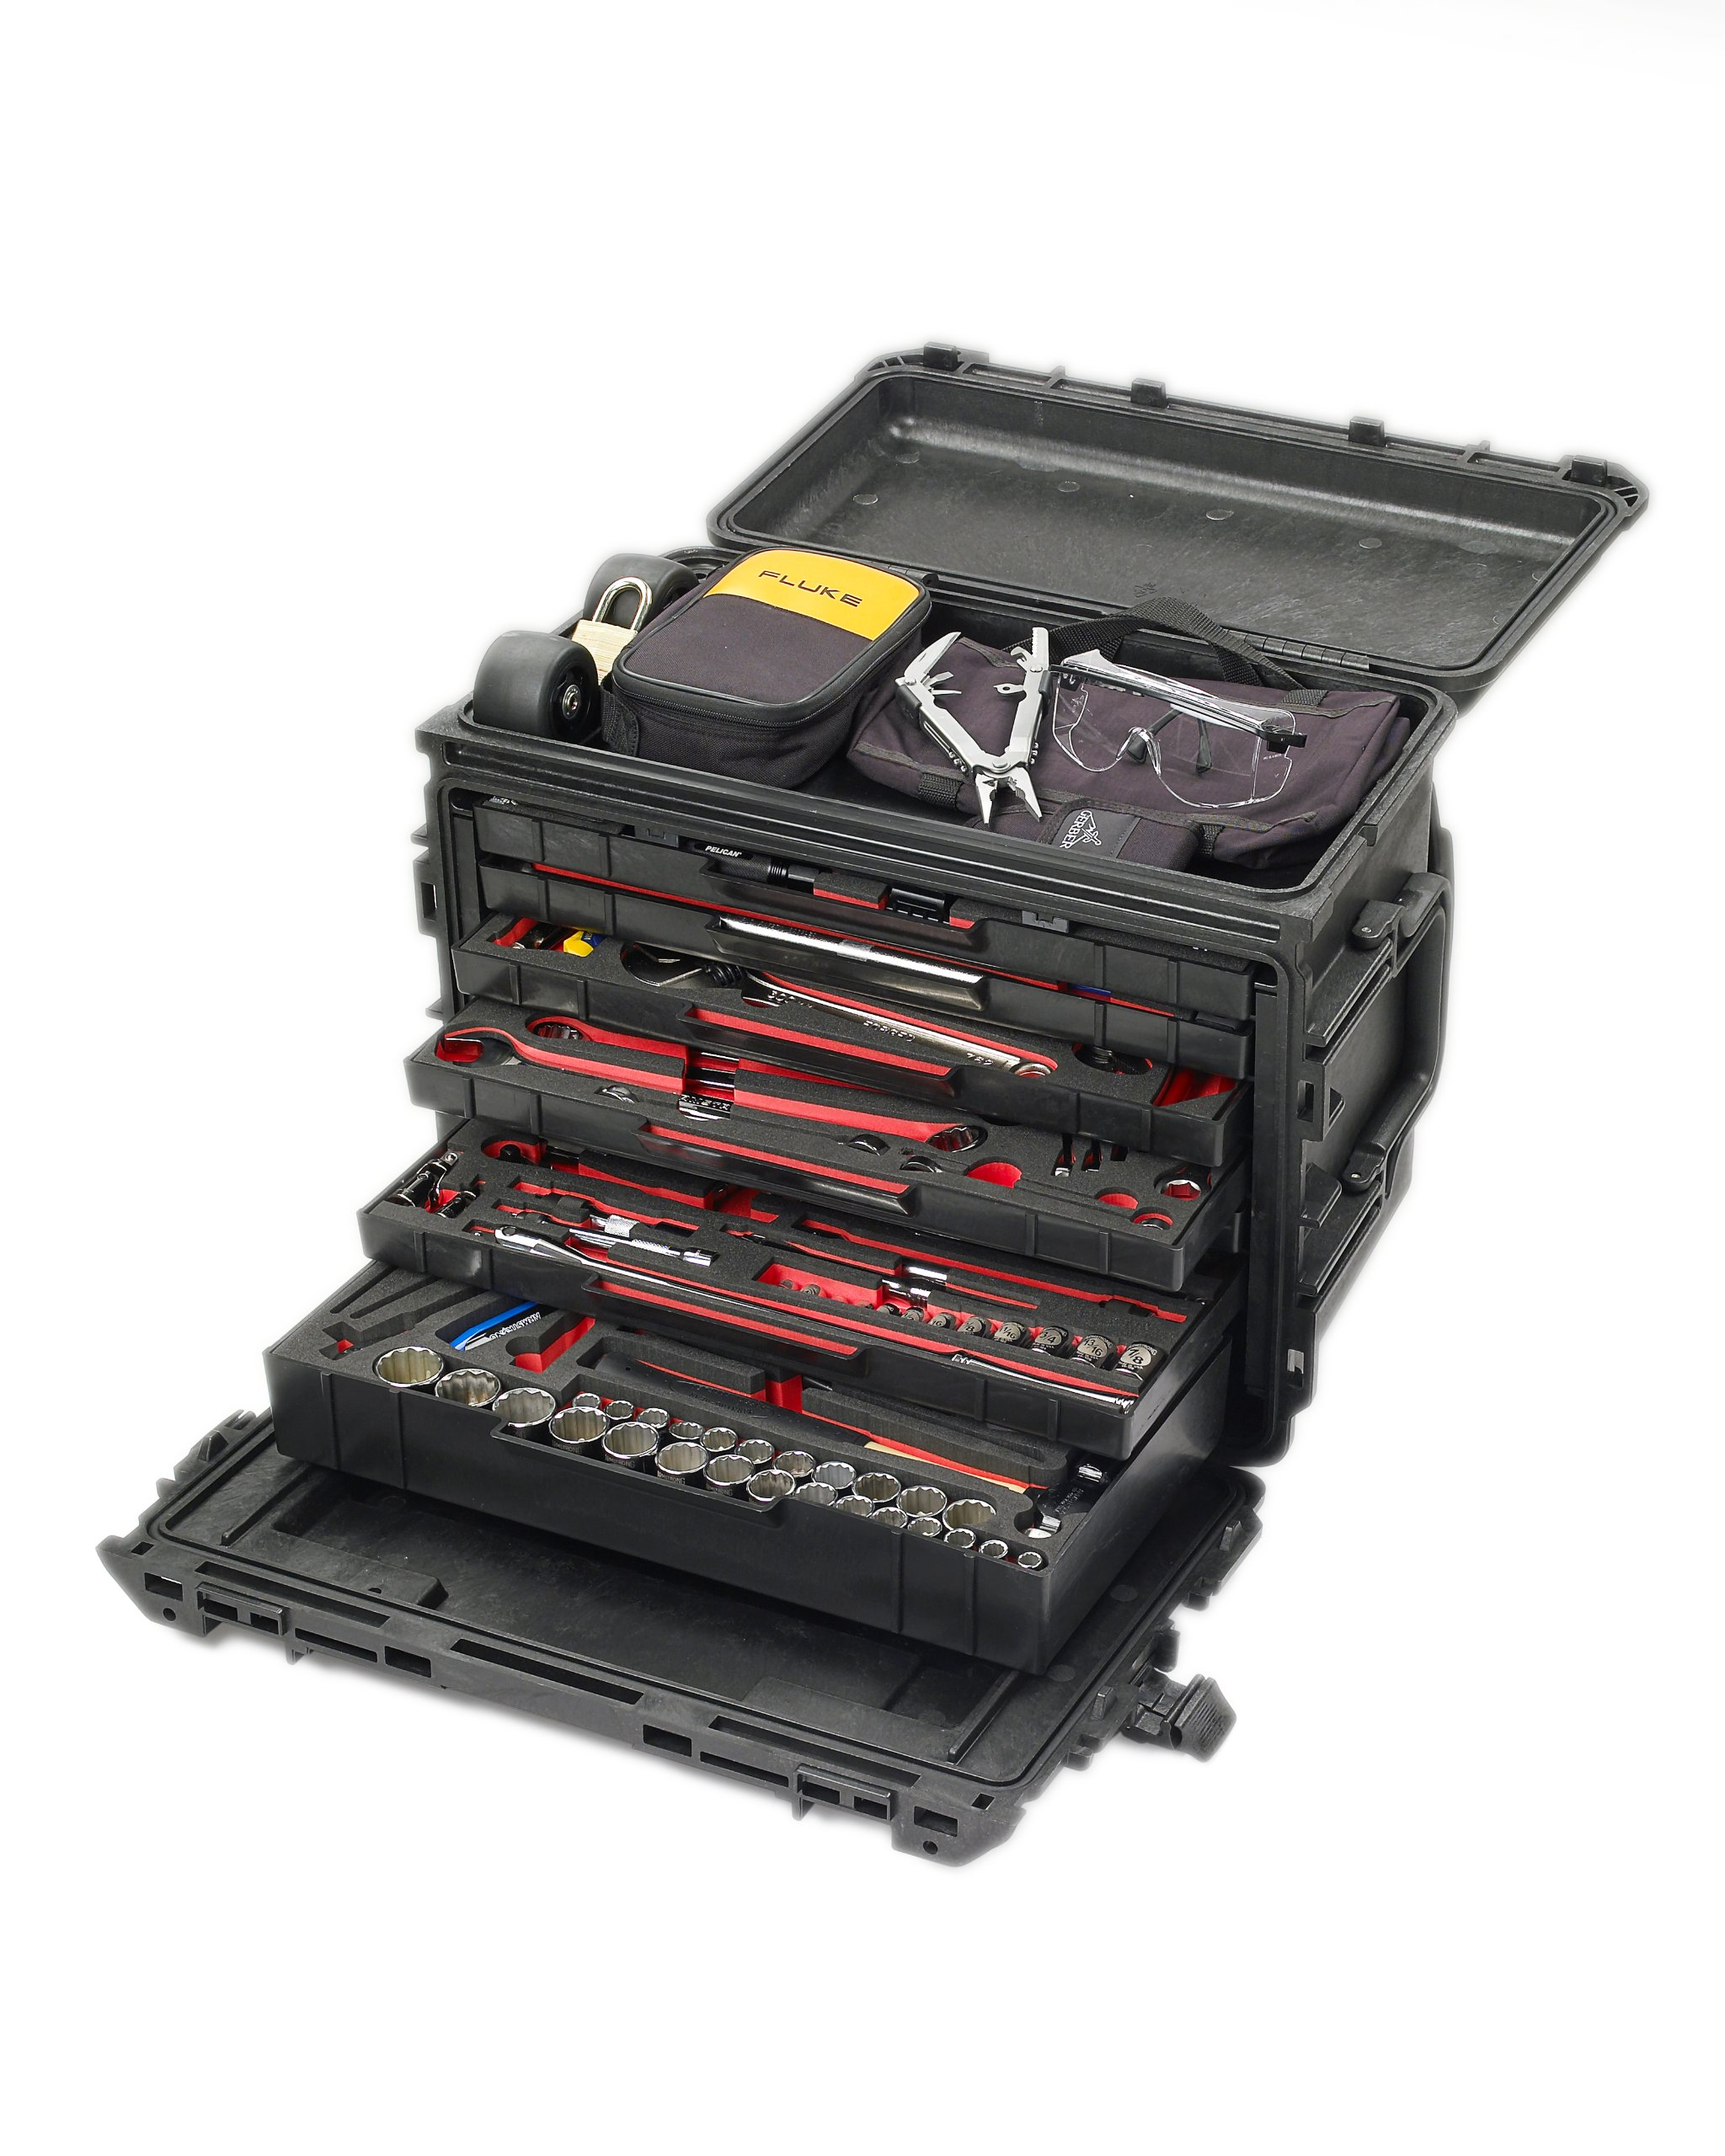 Armstrong SGMTK1 General Mechanics Tool Kit